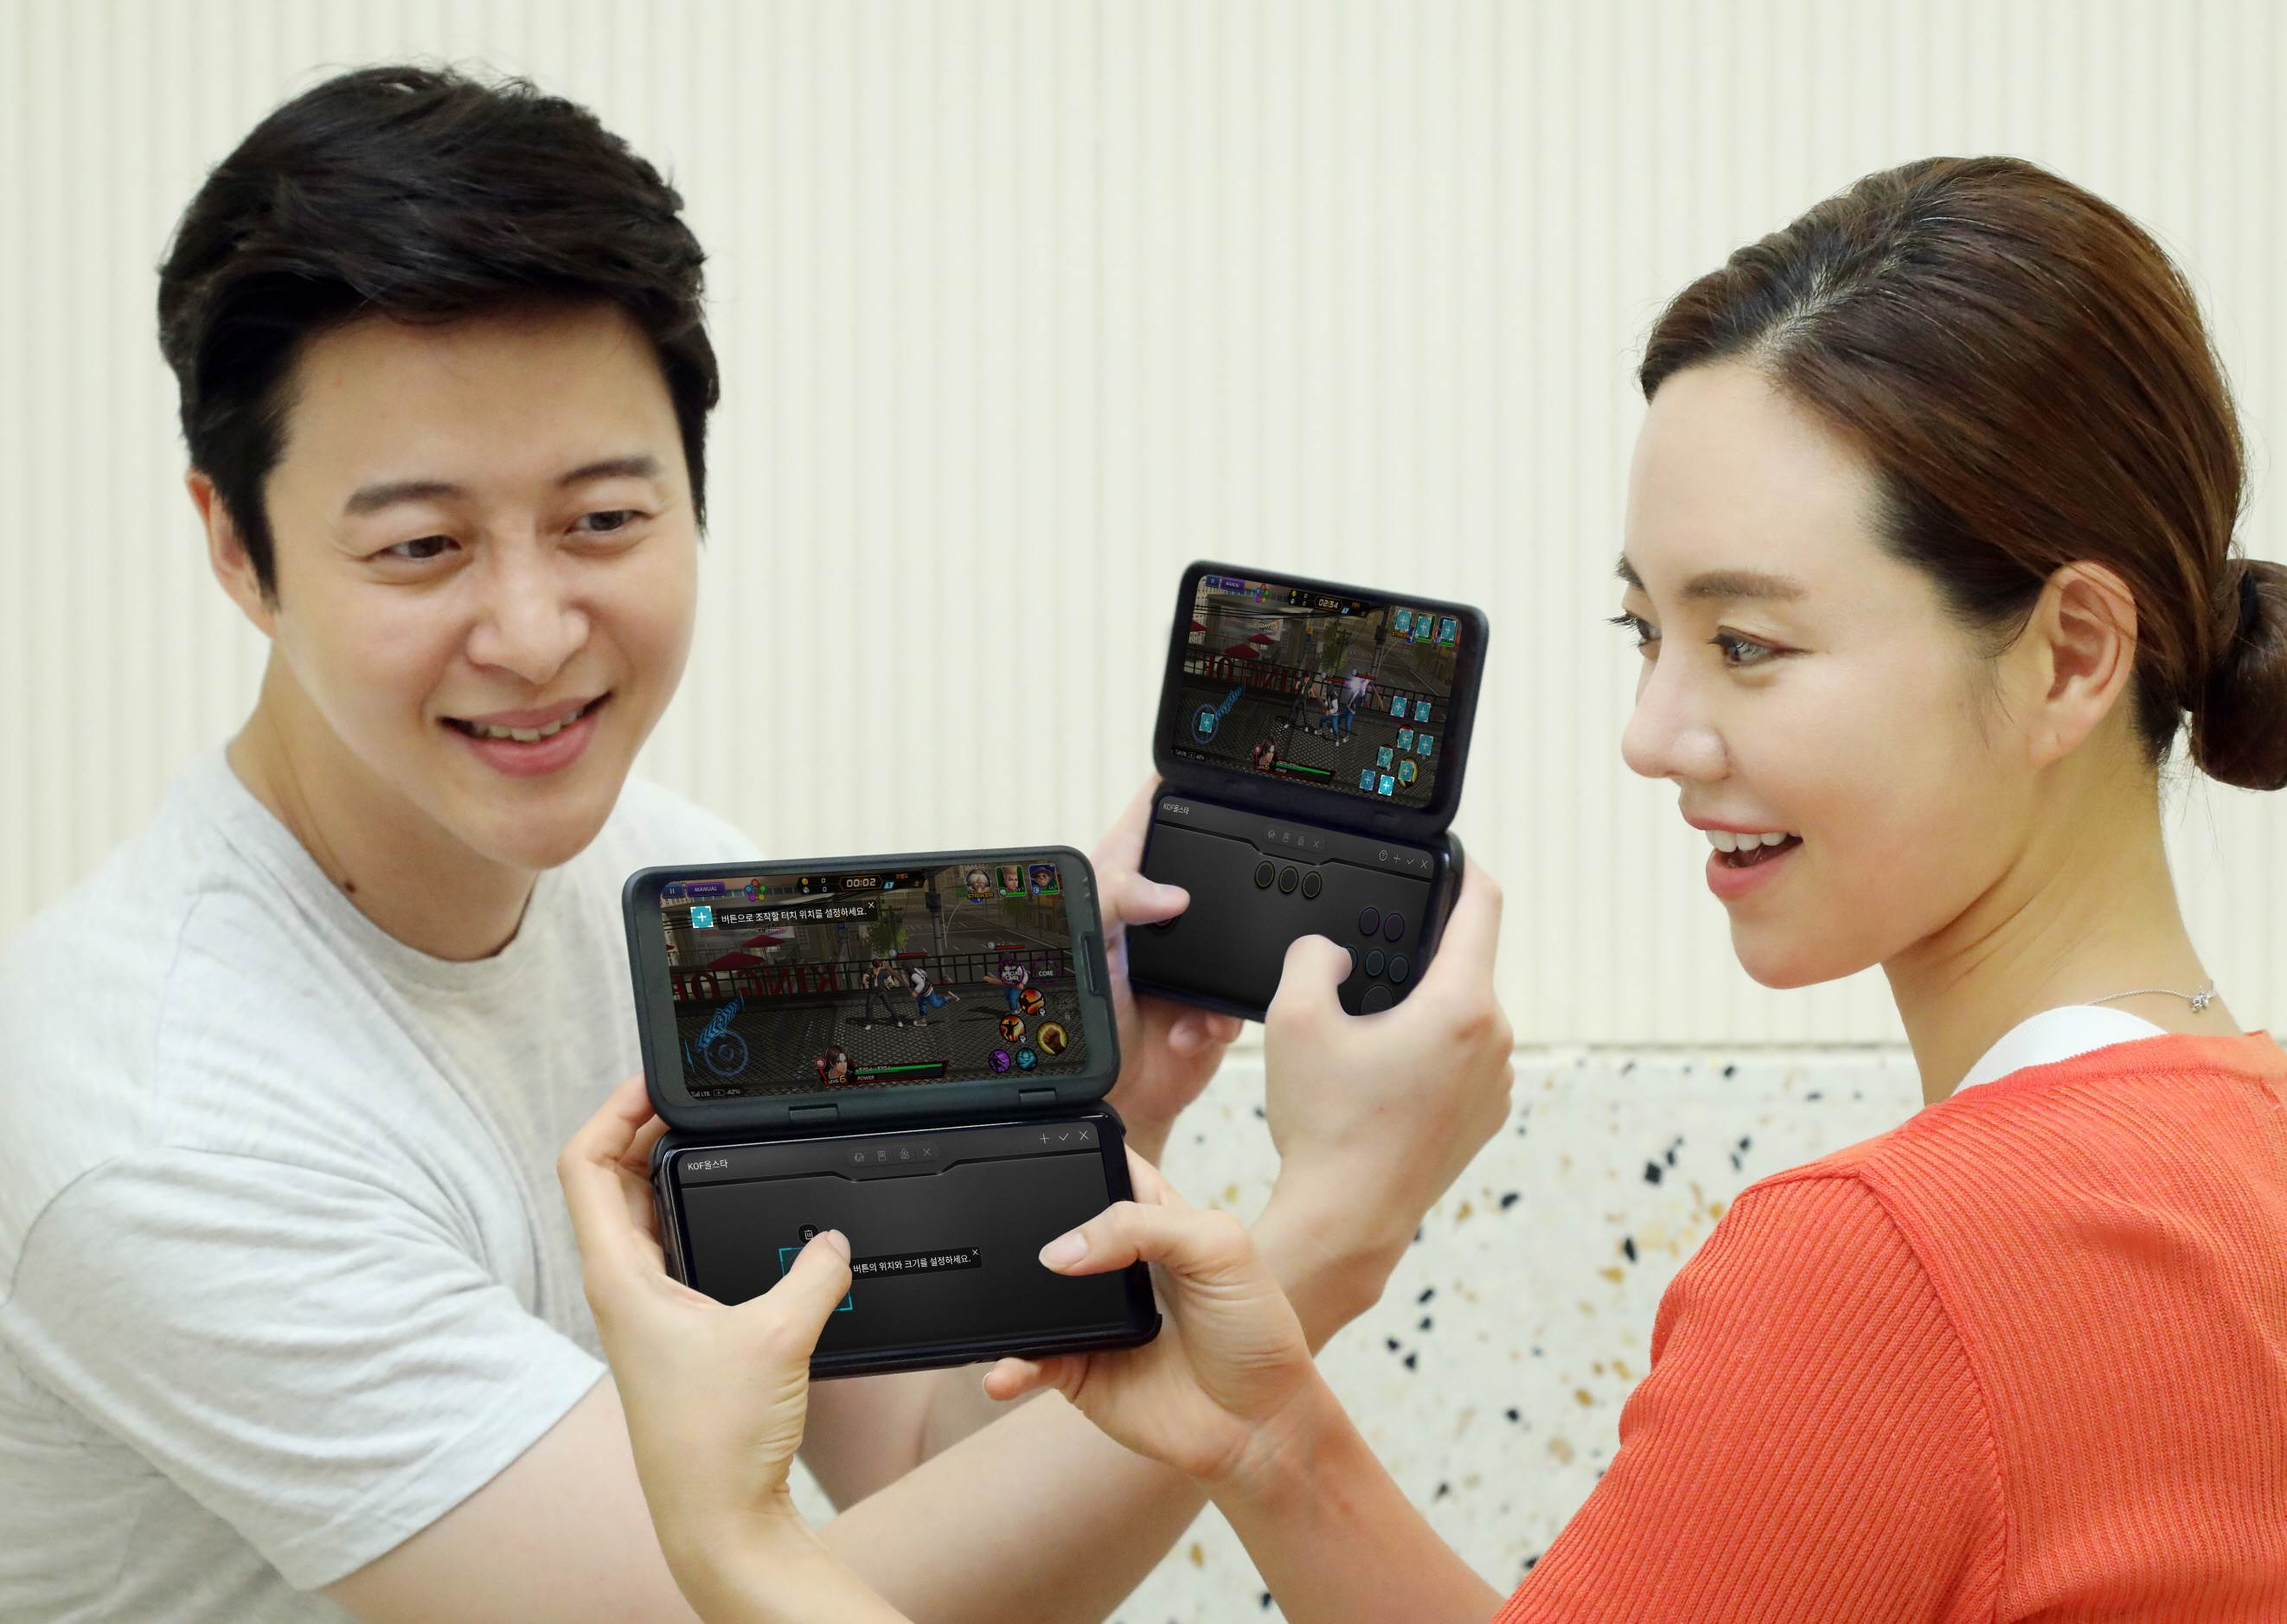 LG 게임패드, 이제 입맛대로 만들어 쓴다 '나만의 게임패드' SW 업데이트 실시